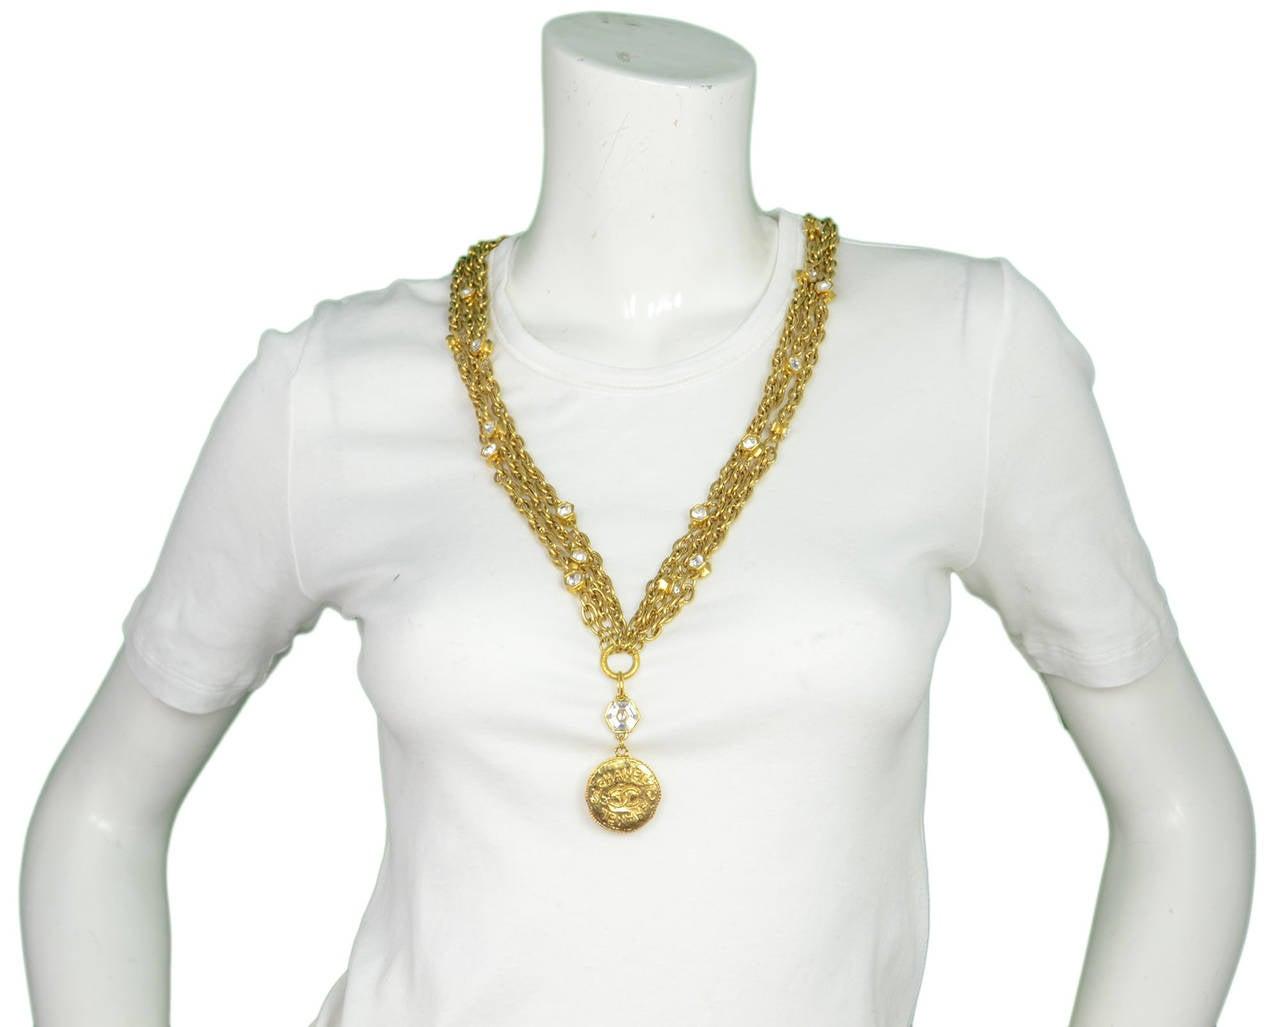 CHANEL Vintage 70's-80's Gold Chain Multi-Strand Necklace w/CC Pendant 8